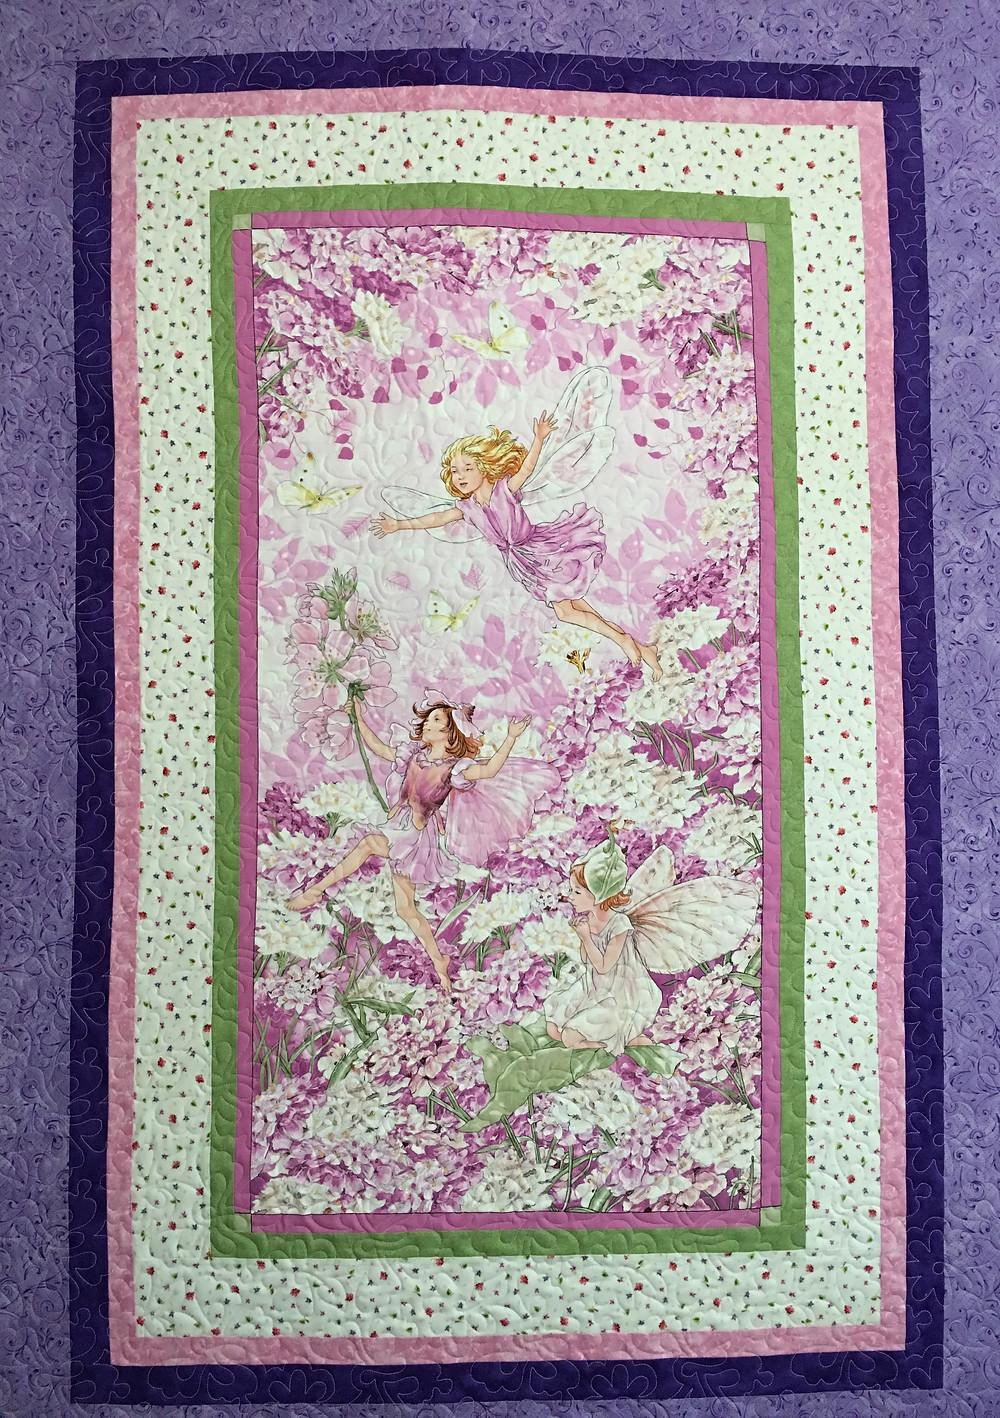 Terri Baby Quilt with Fairy's